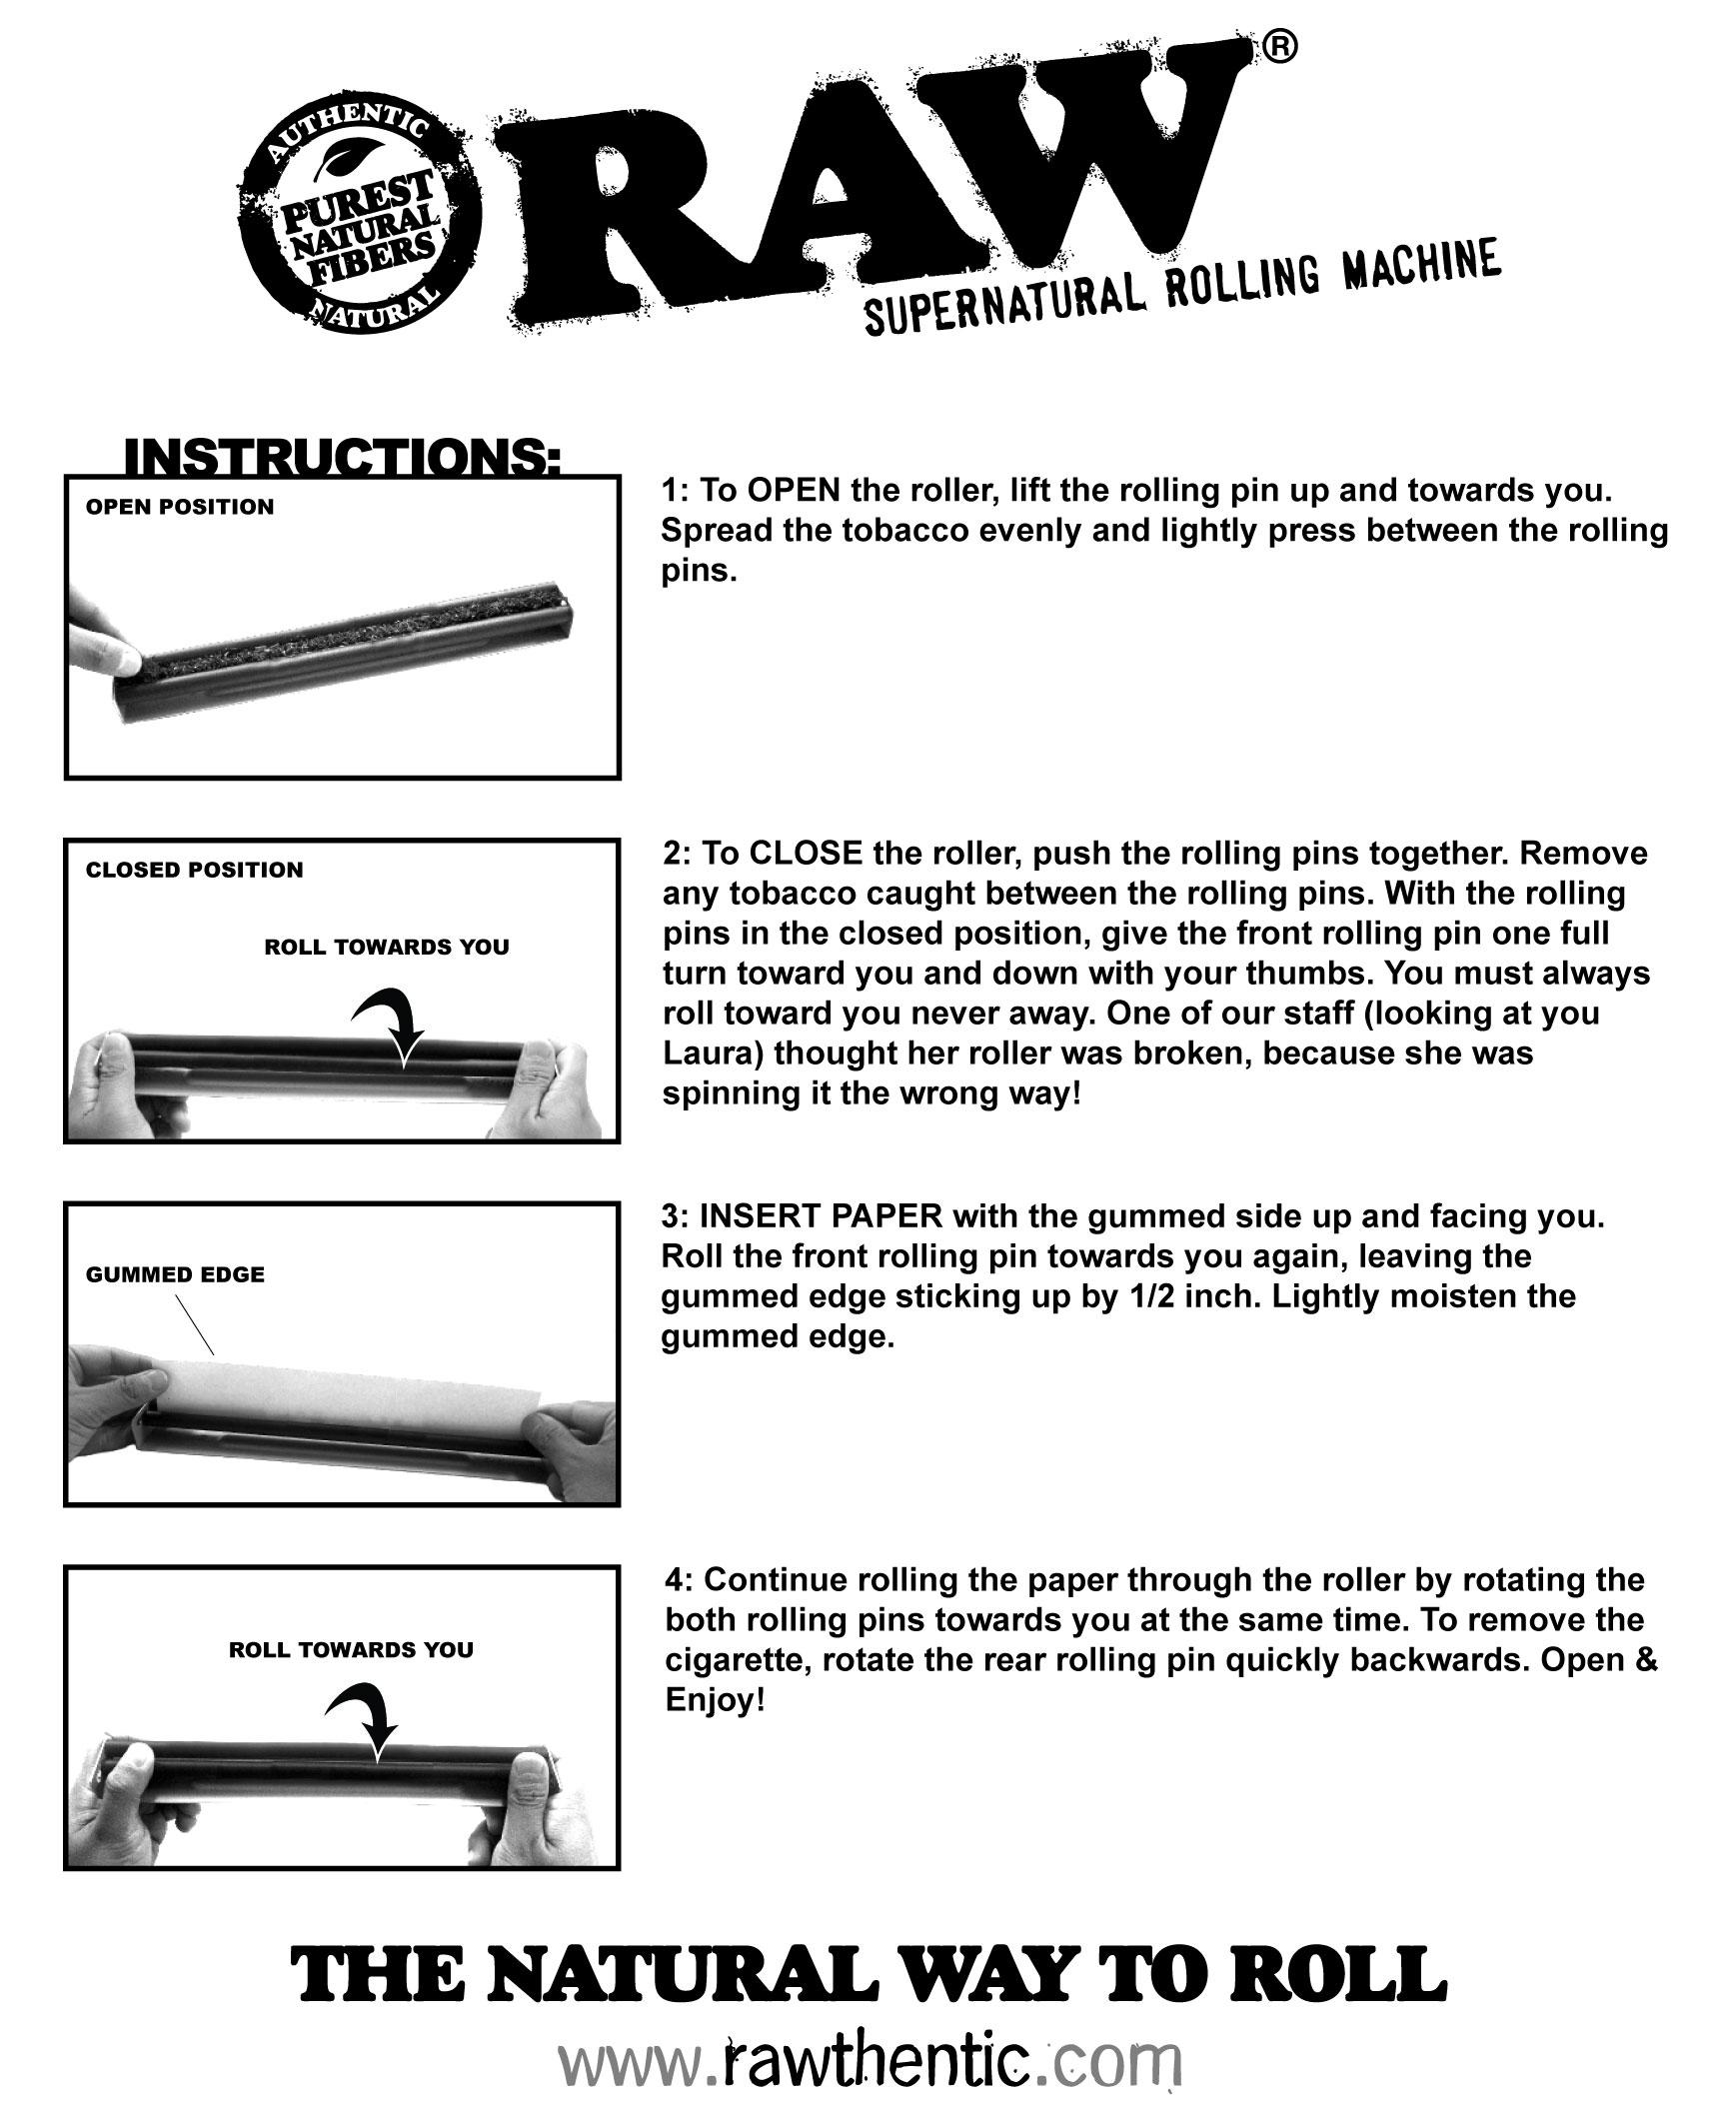 RAW Supernatural Roller Instructions